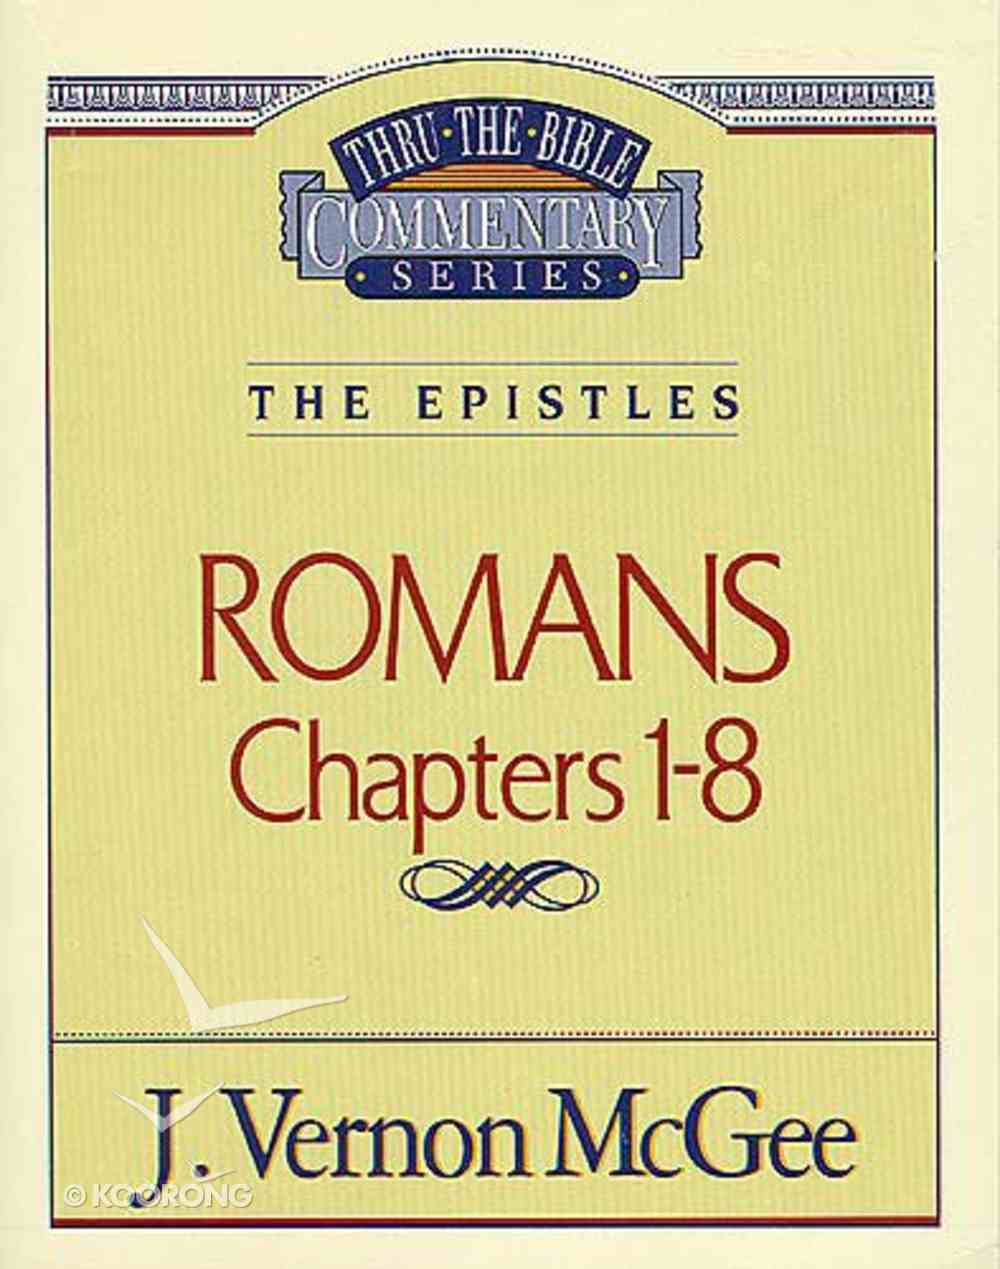 Thru the Bible NT #42: Romans (Volume 1) (#42 in Thru The Bible New Testament Series) Paperback